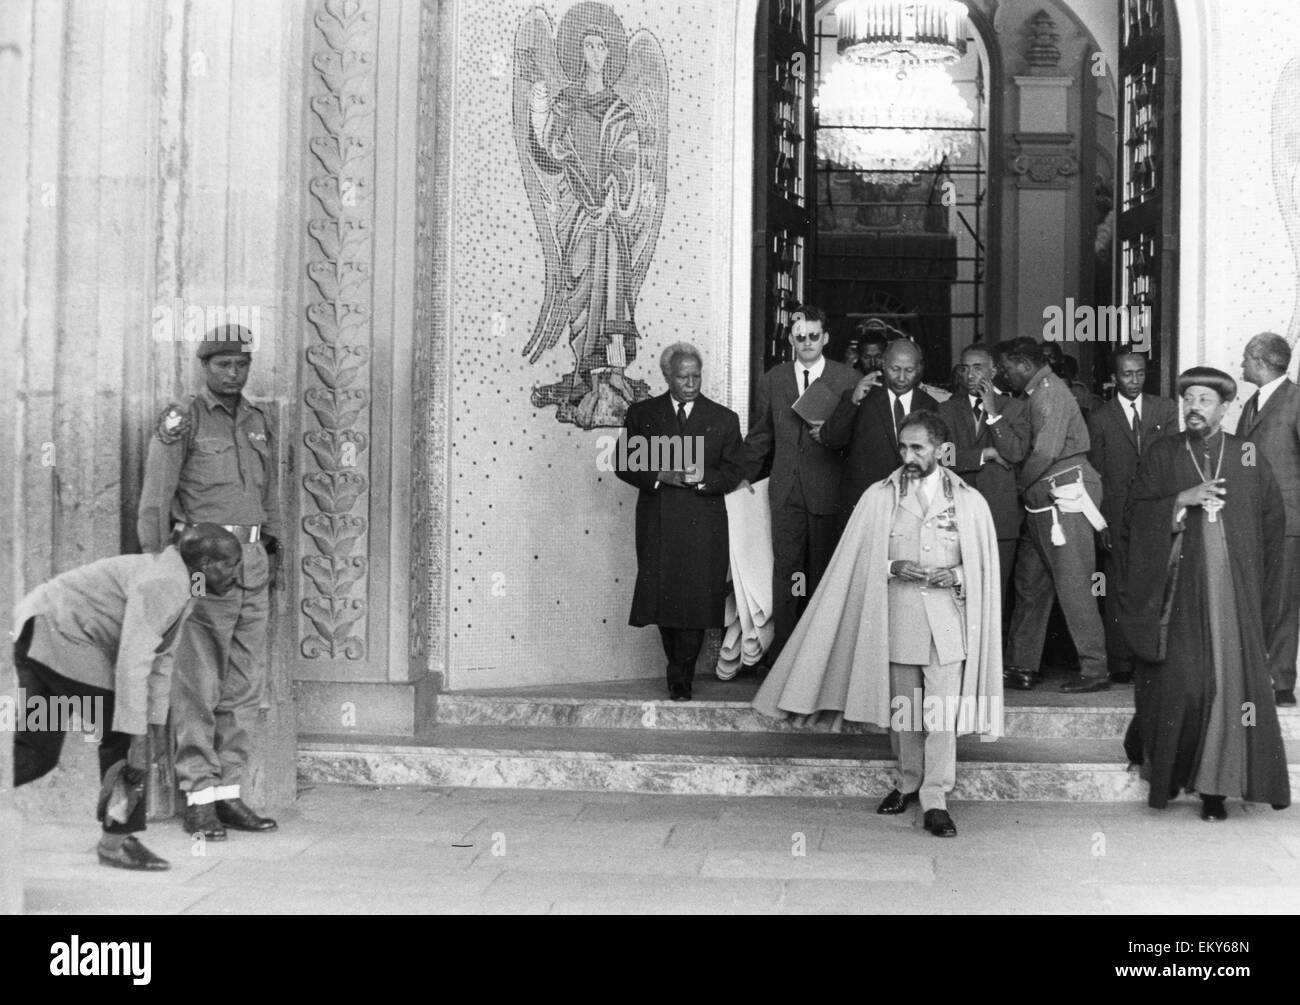 HAILE SELASSIE (1892-1975) Etheopian Regent about 1955 - Stock Image